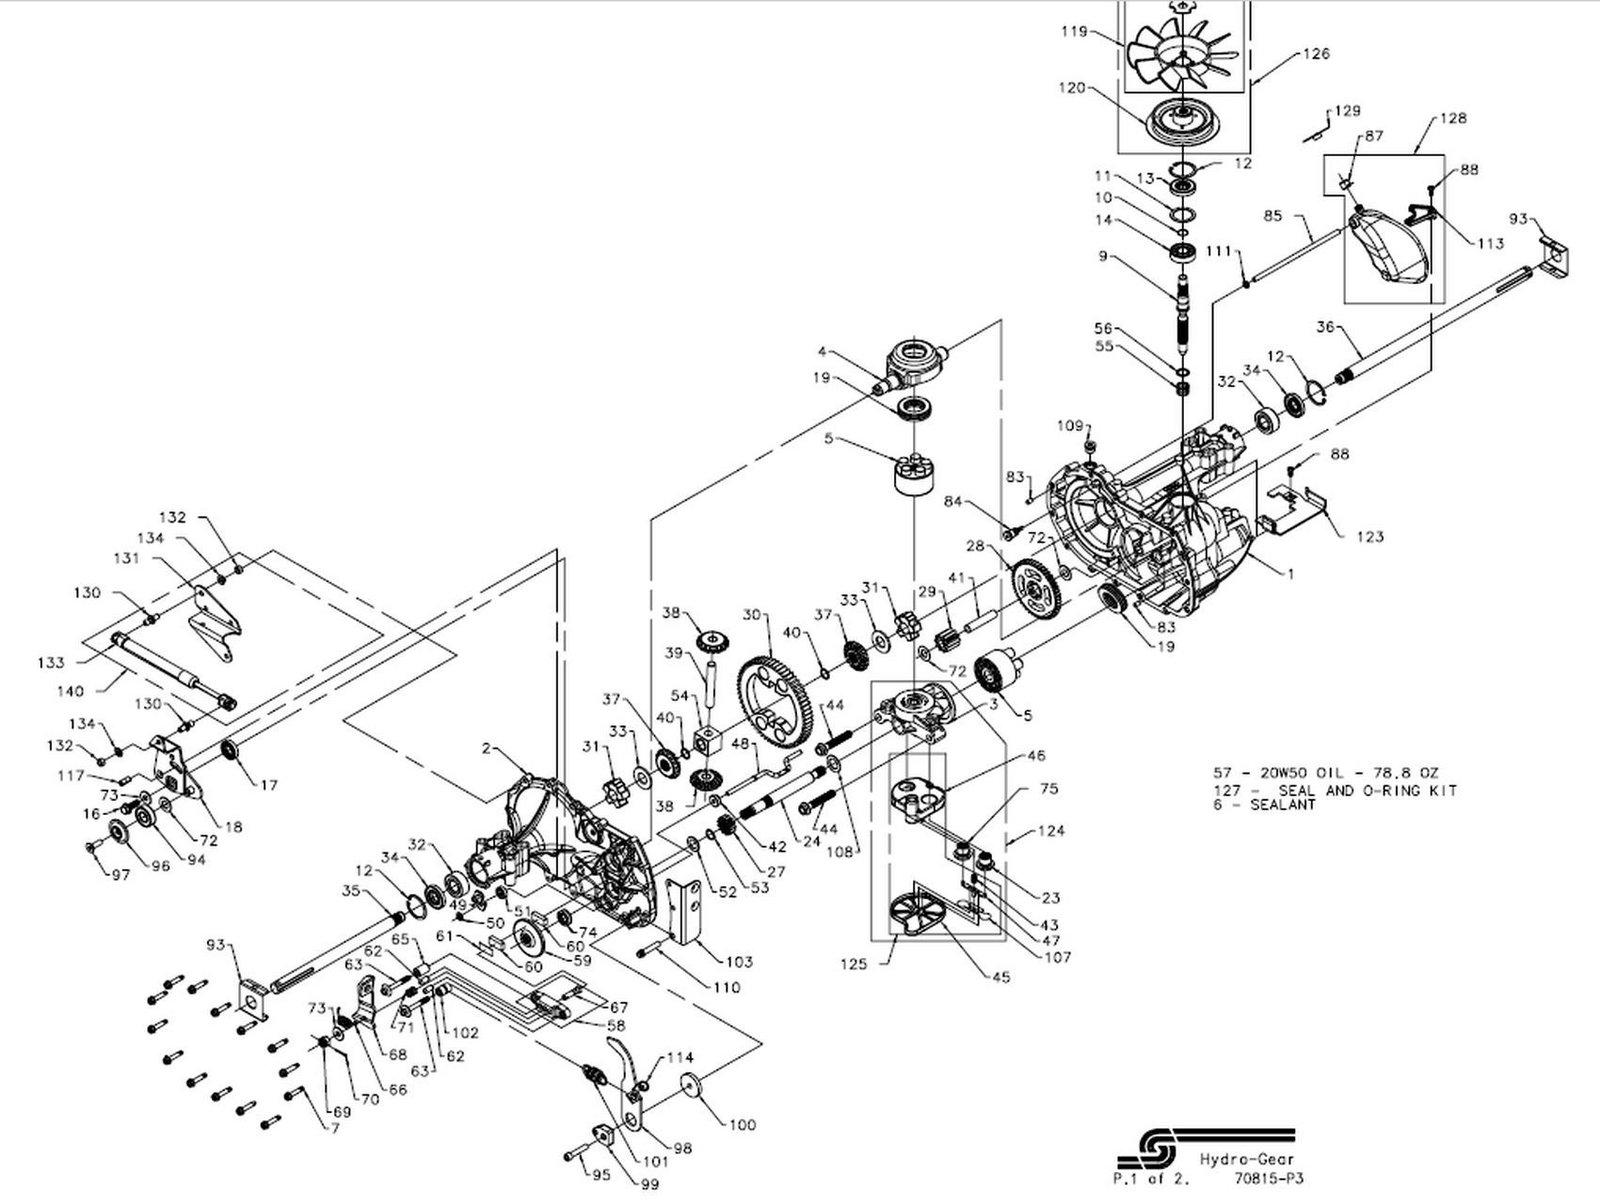 Craftsman hydrostatic transmission diagram images craftsman hydrostatic transmission diagram images